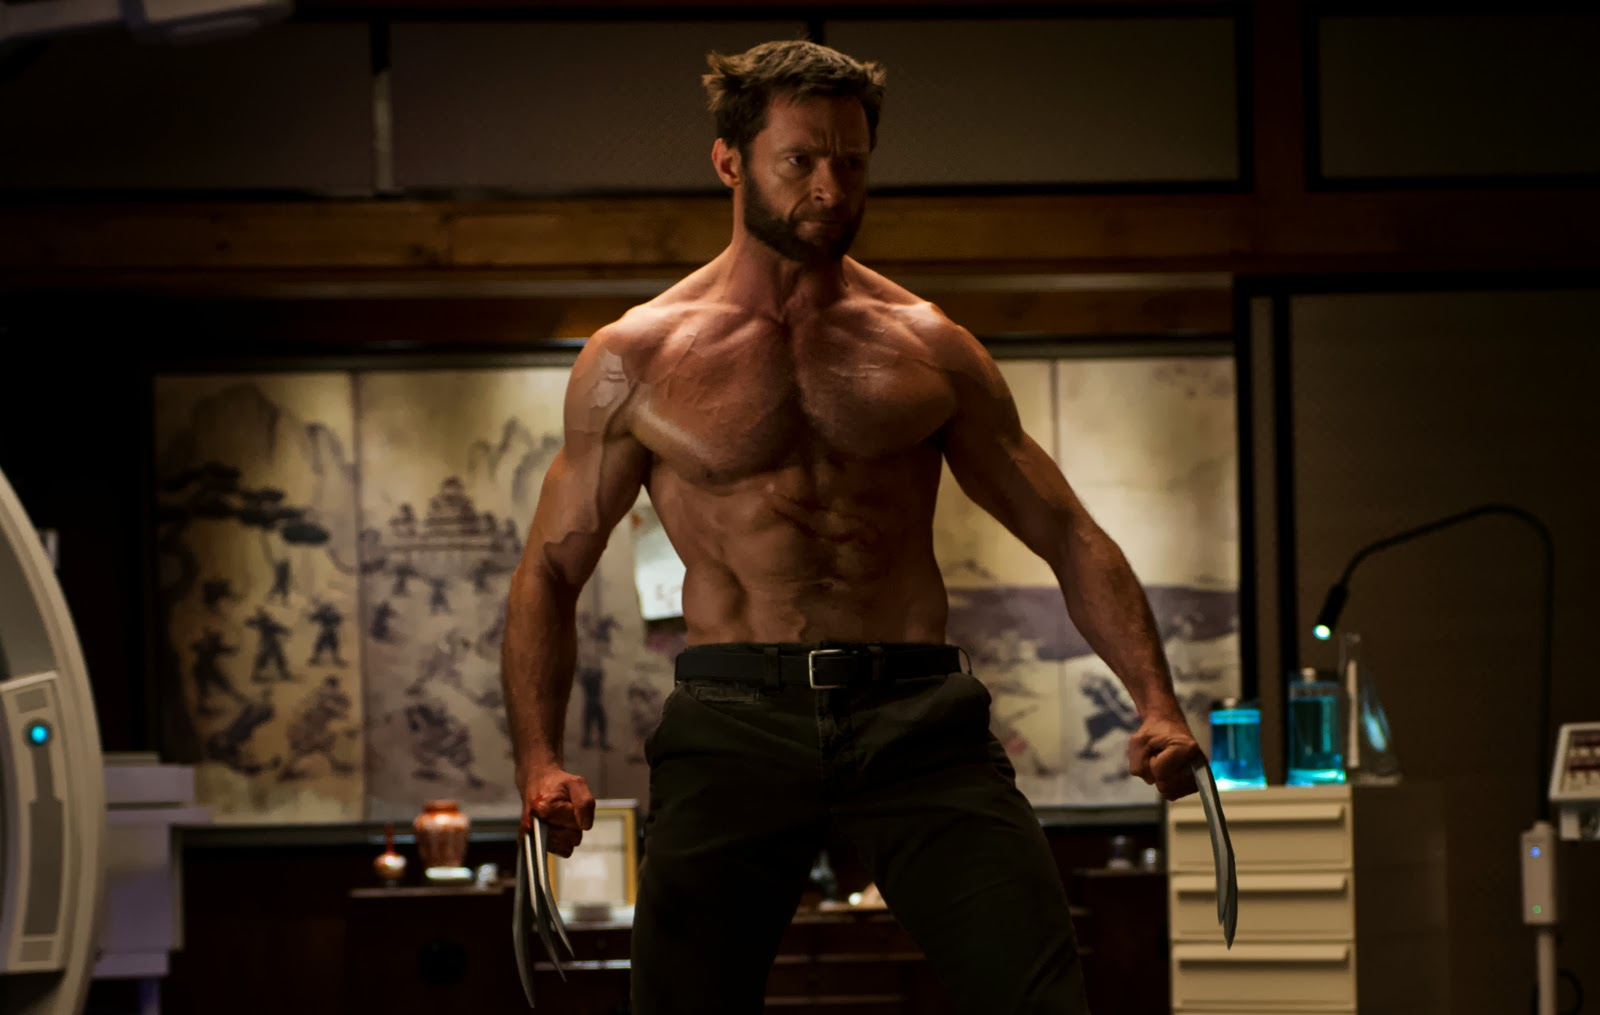 Origin Story News – Hugh Jackman in Avengers 4? Not So Fast!